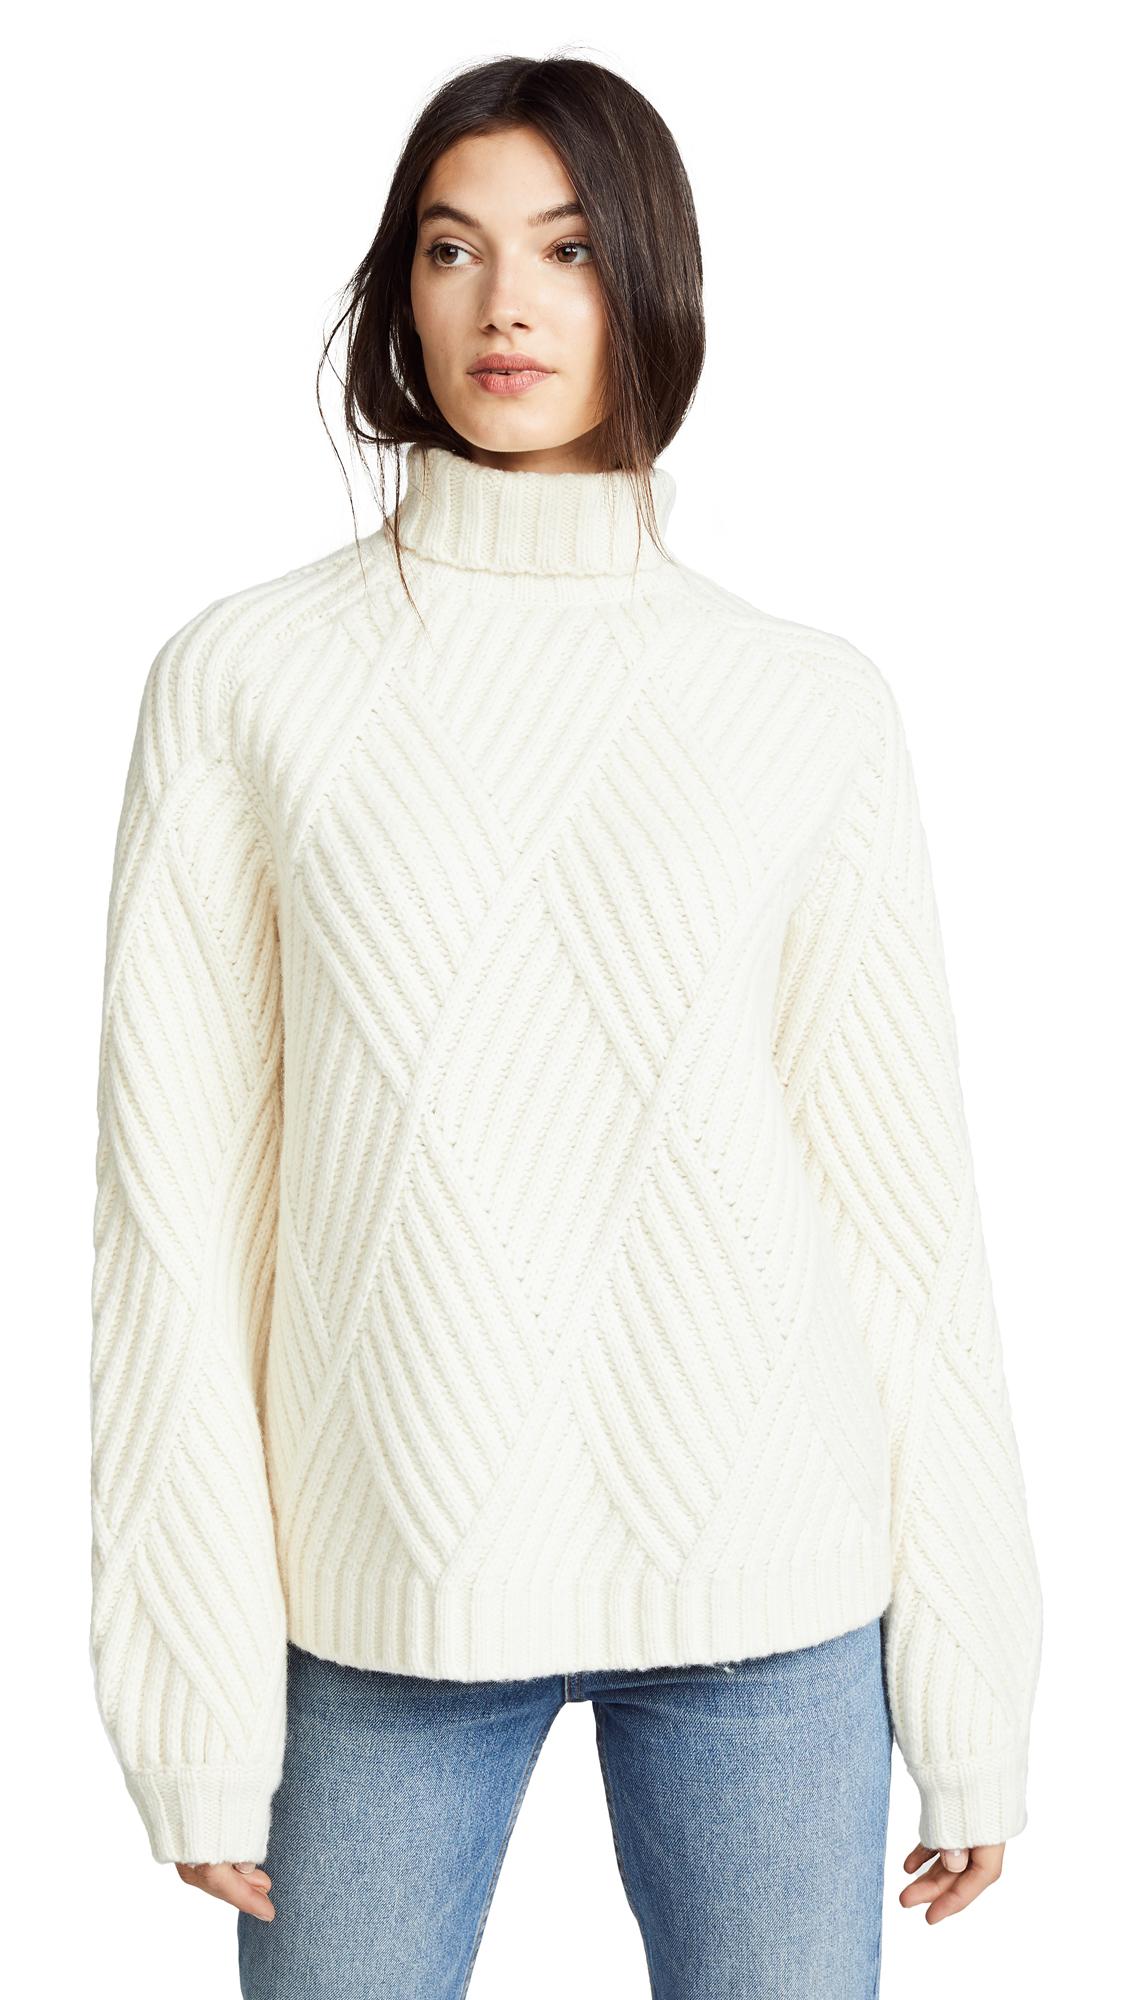 Victoria Victoria Beckham Classic Raglan Turtleneck Sweater In Ivory